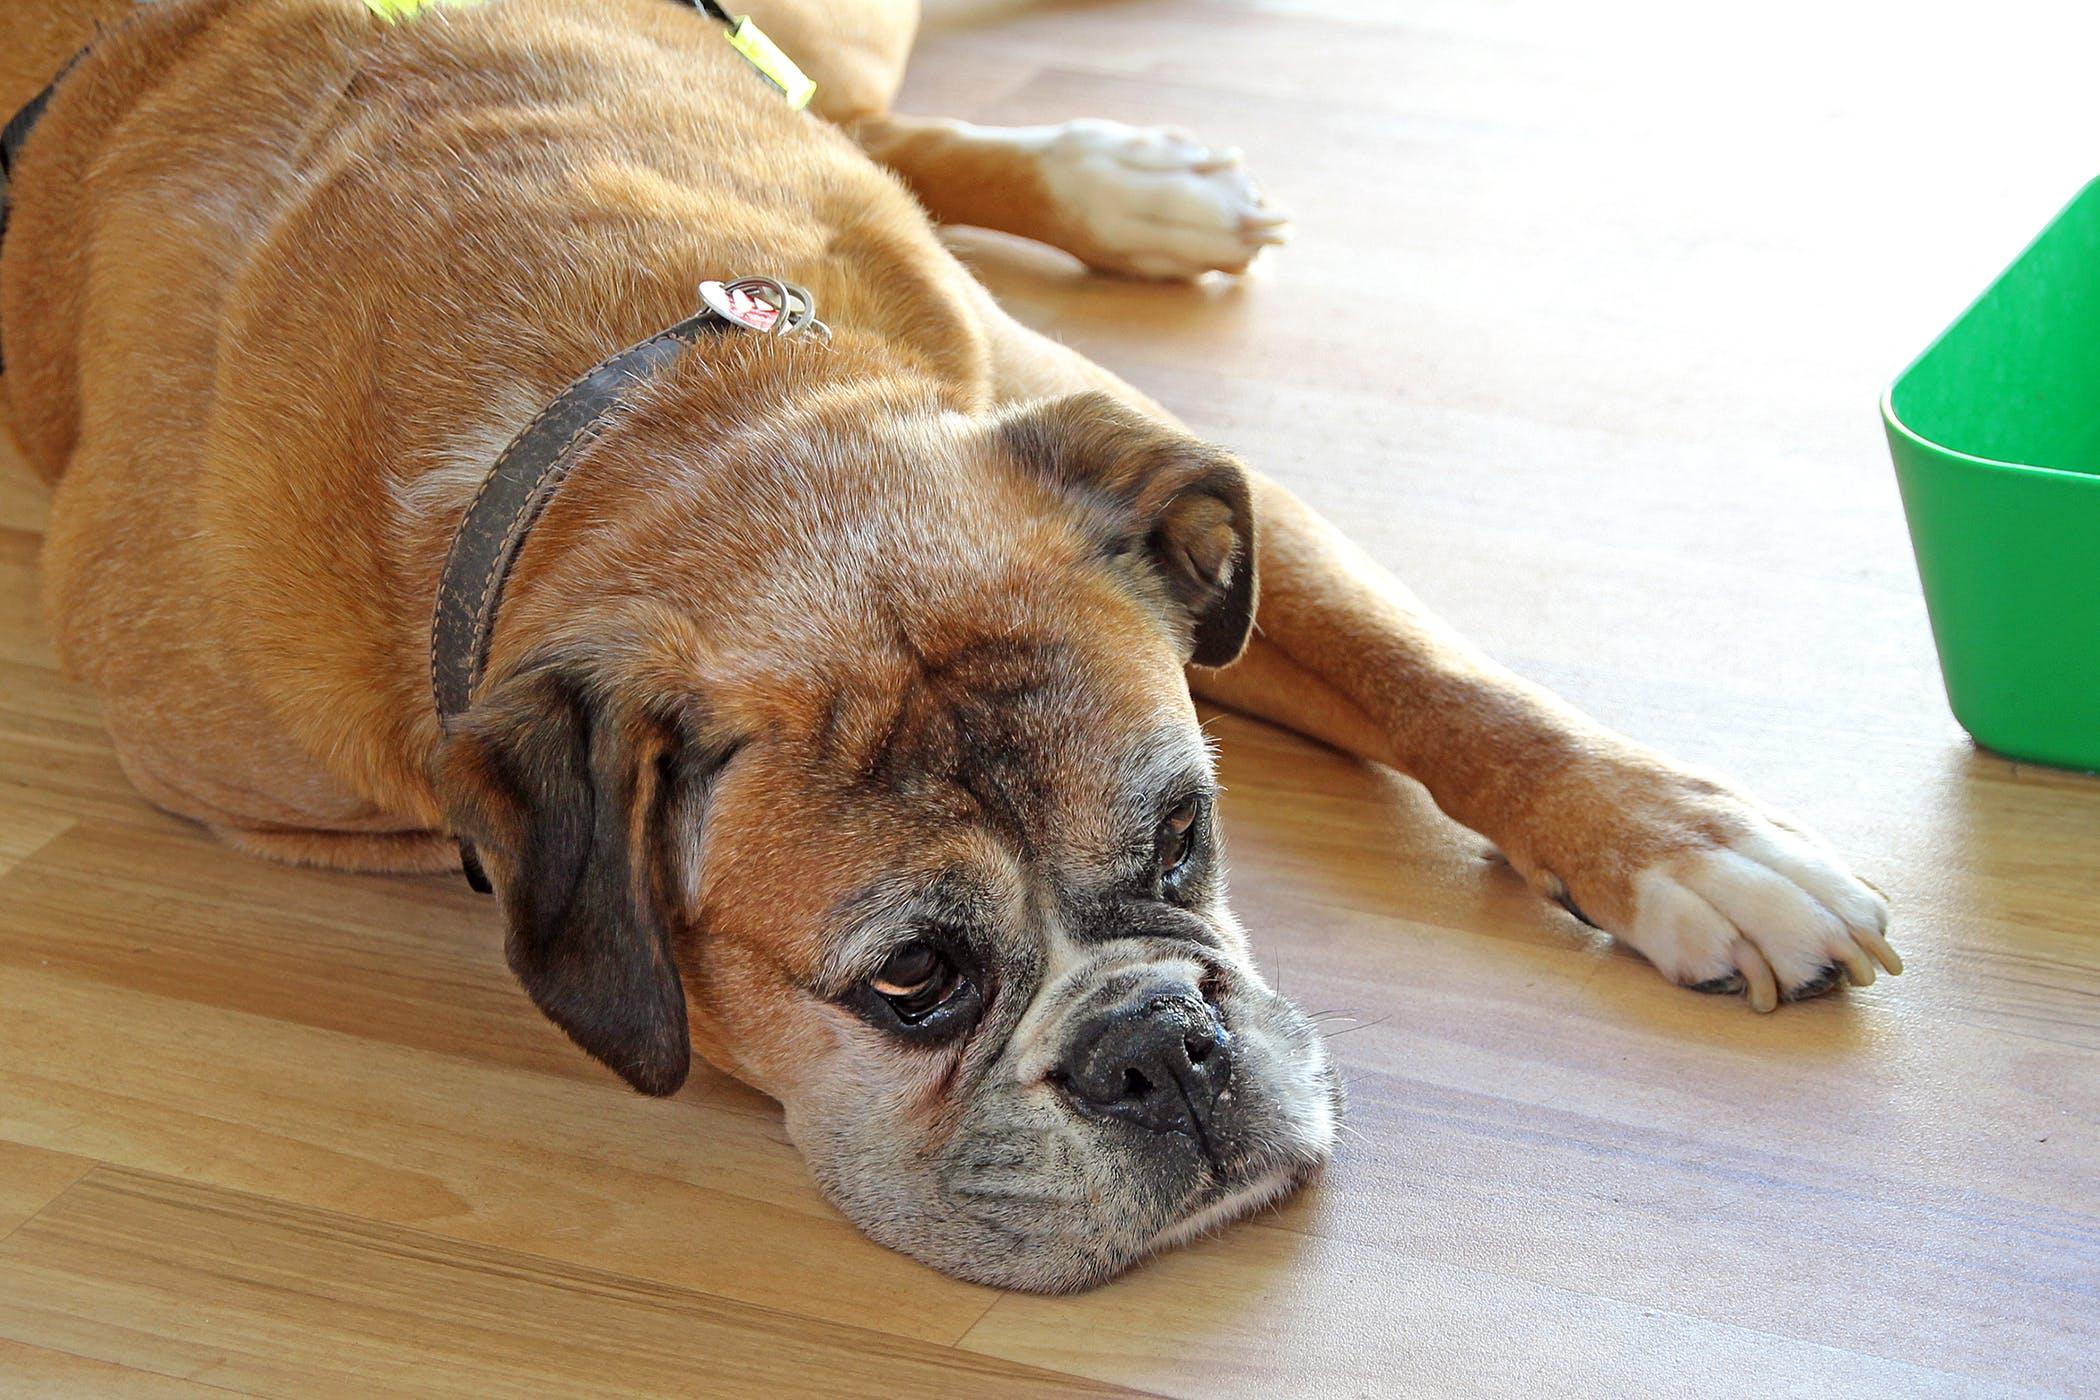 Pulmonary Edema in Dogs - Symptoms, Causes, Diagnosis